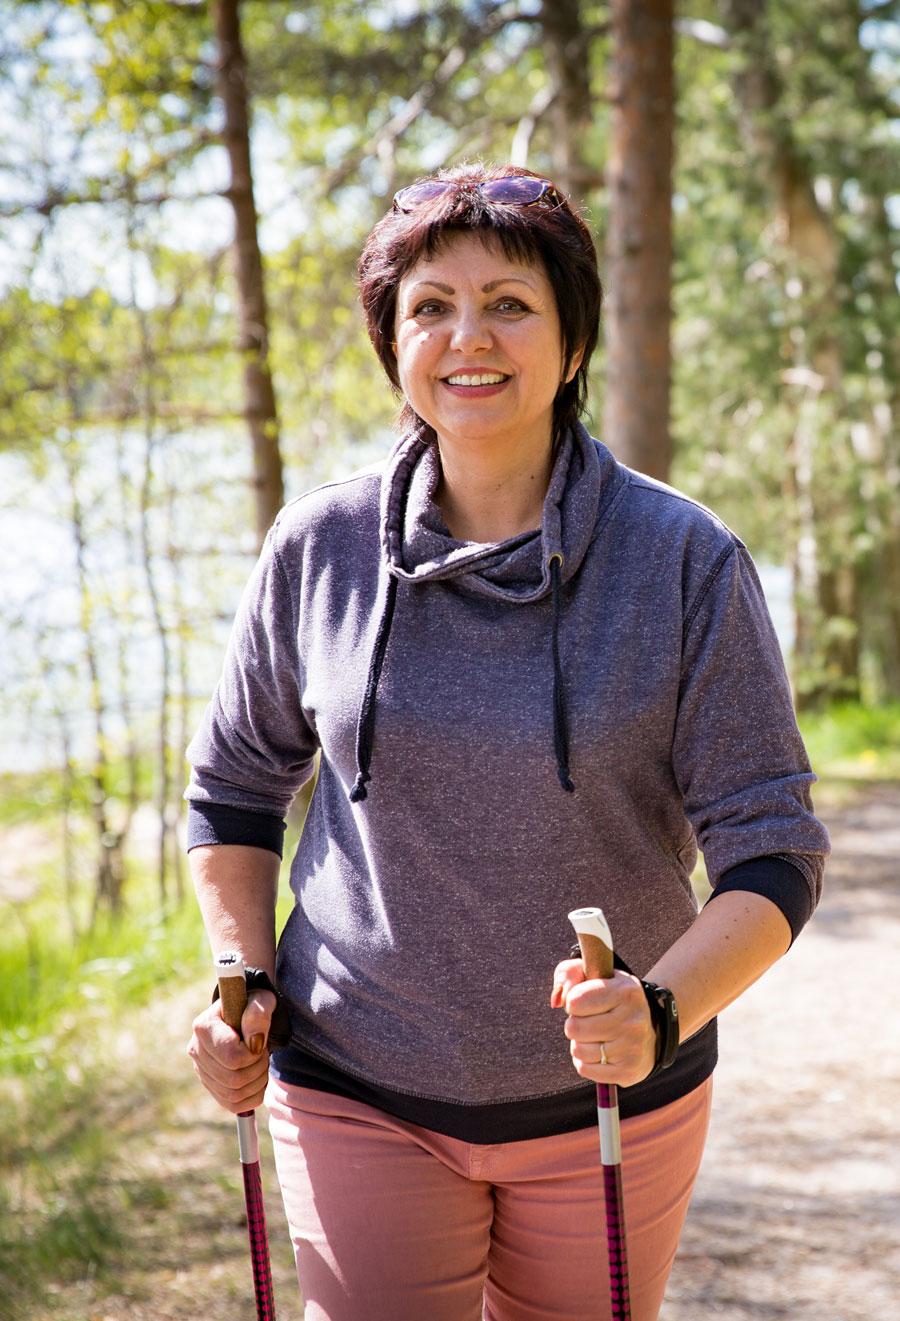 woman walking on wooded trail using hiking sticks